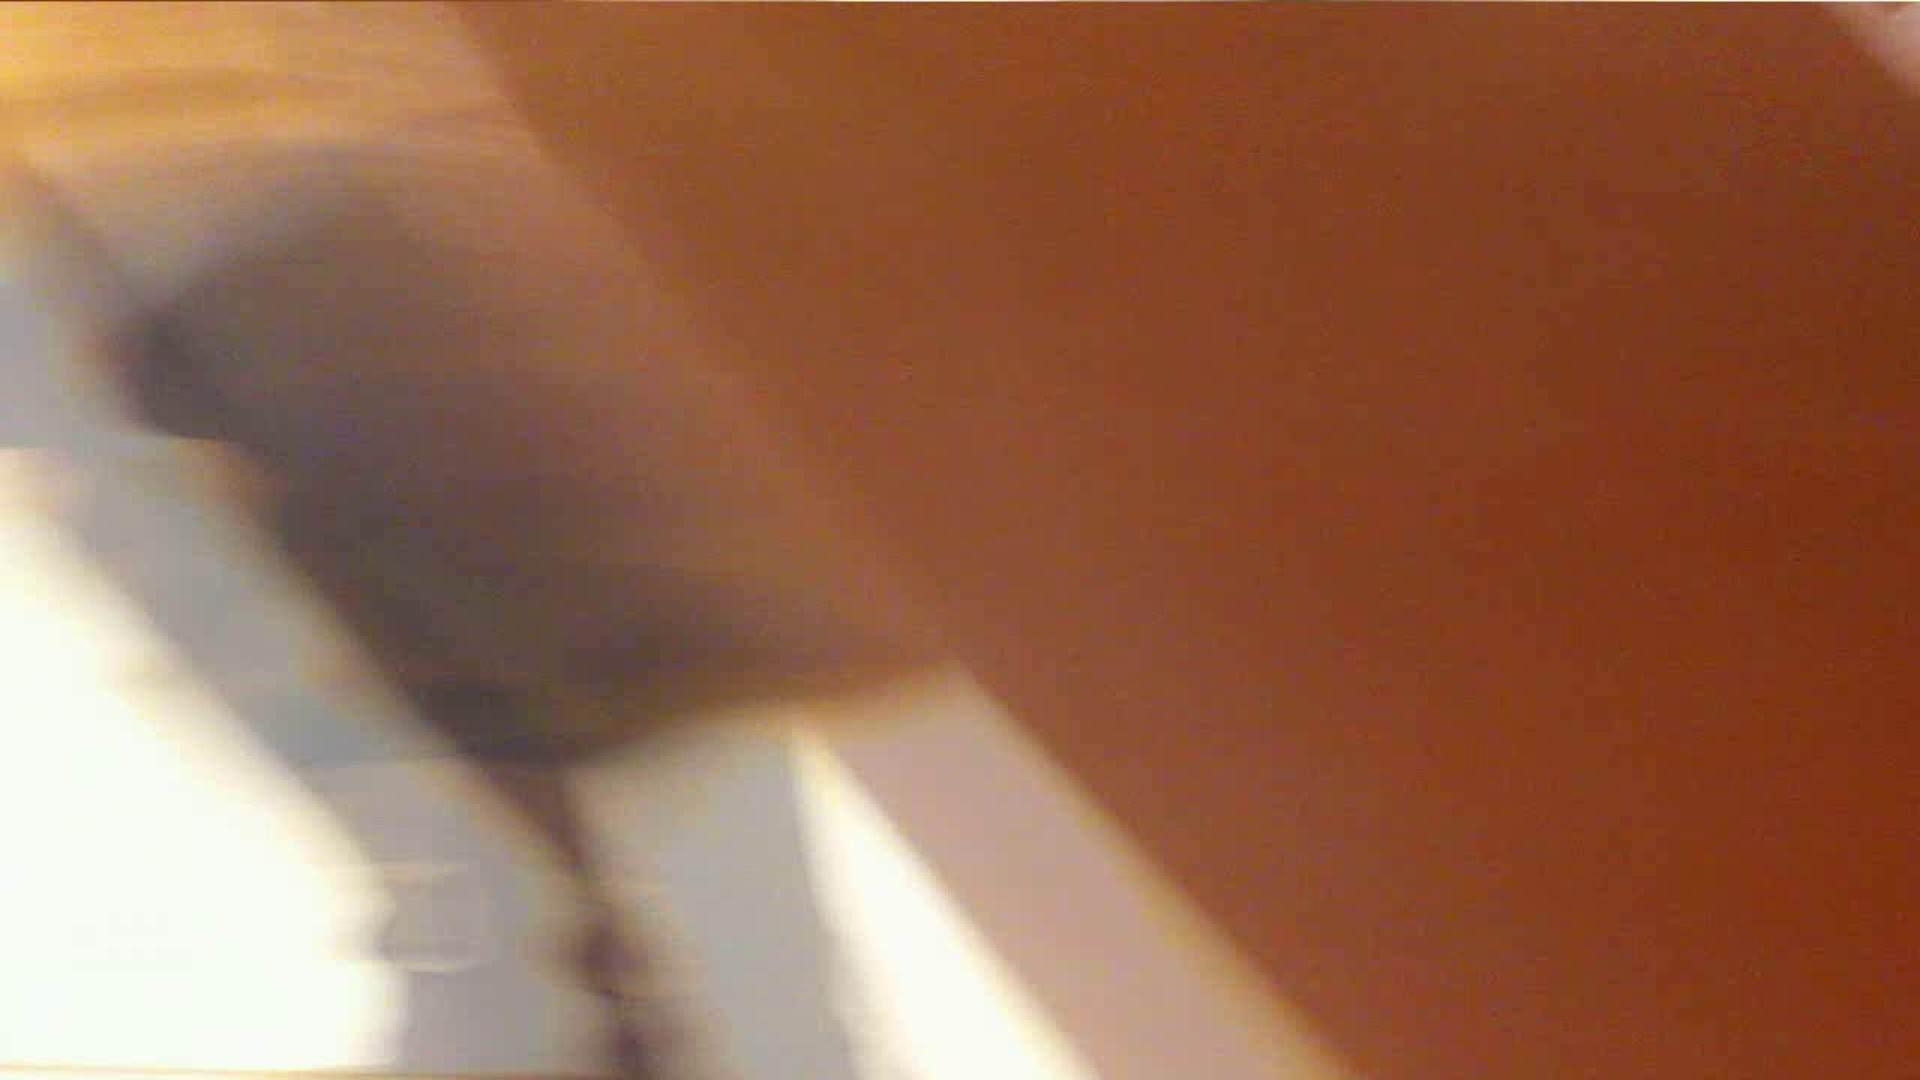 vol.34 美人アパレル胸チラ&パンチラ メガネ属性っていいよね♥ チラ | OLエロ画像  66PICs 1